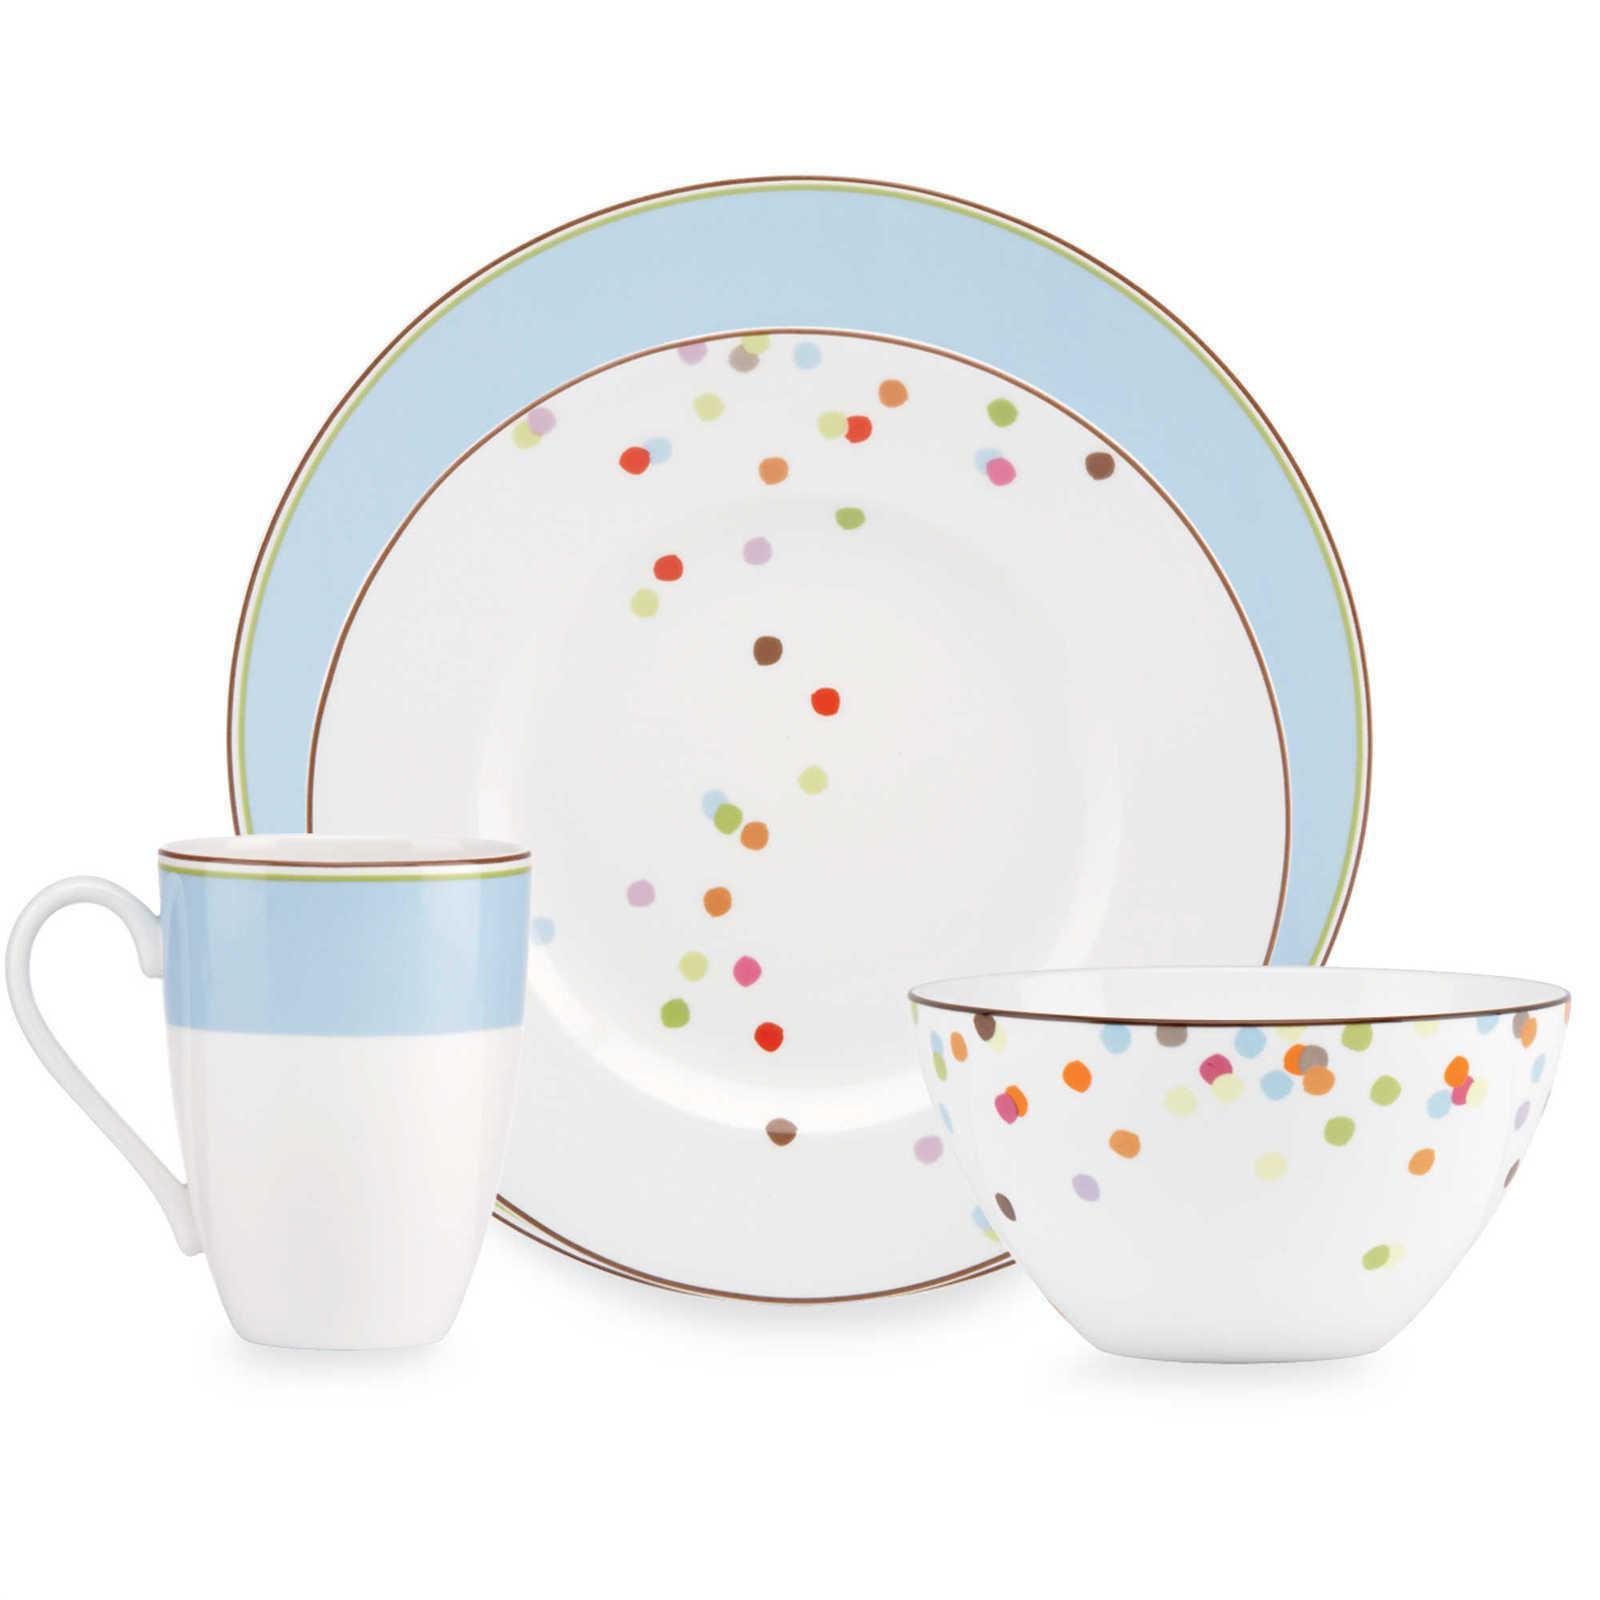 market street dinnerware collection in blue